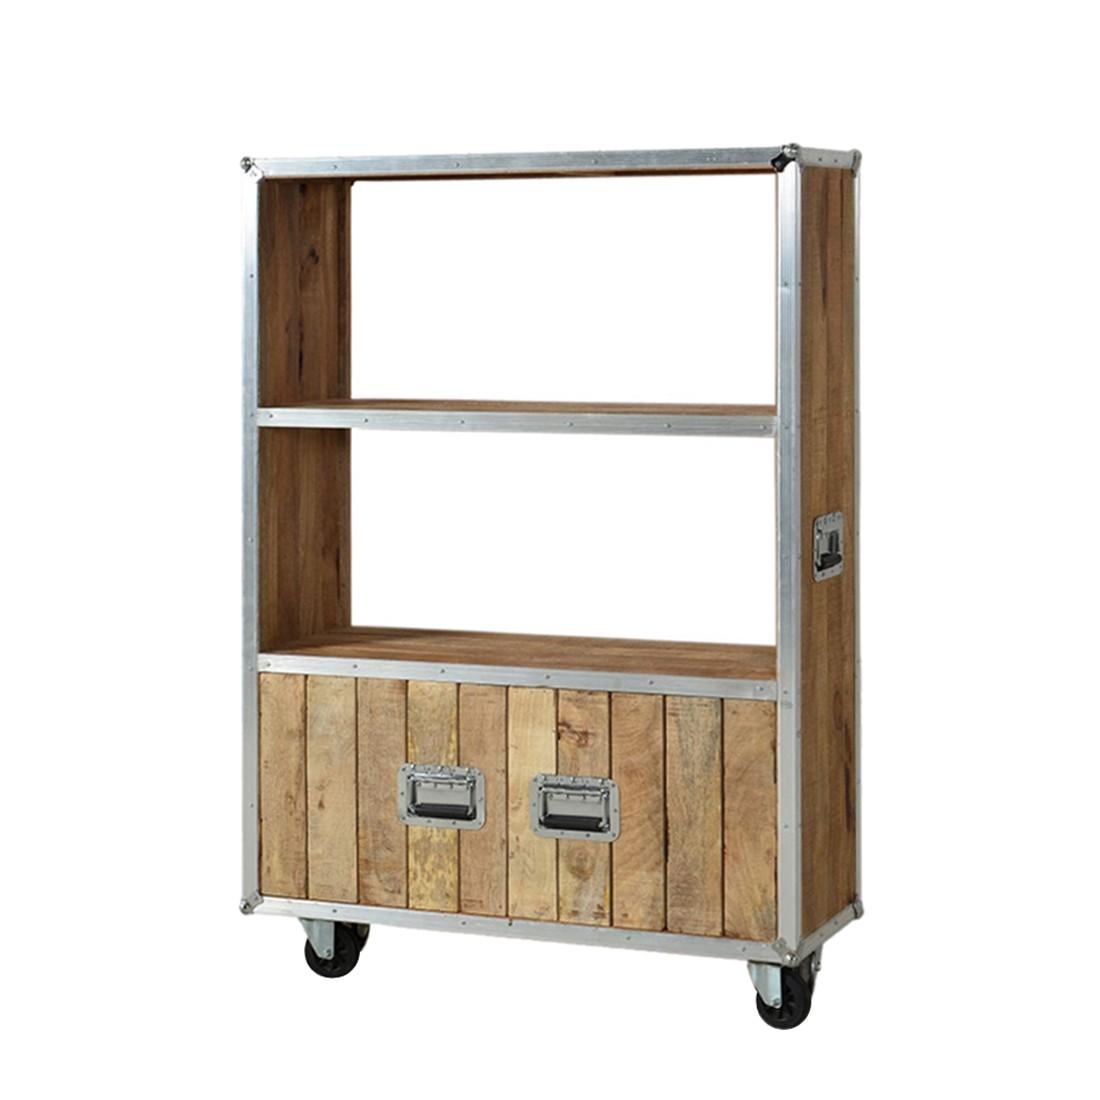 regal auf rollen regal lessy aus stahl auf rollen regal auf rollen industrie design regal auf. Black Bedroom Furniture Sets. Home Design Ideas